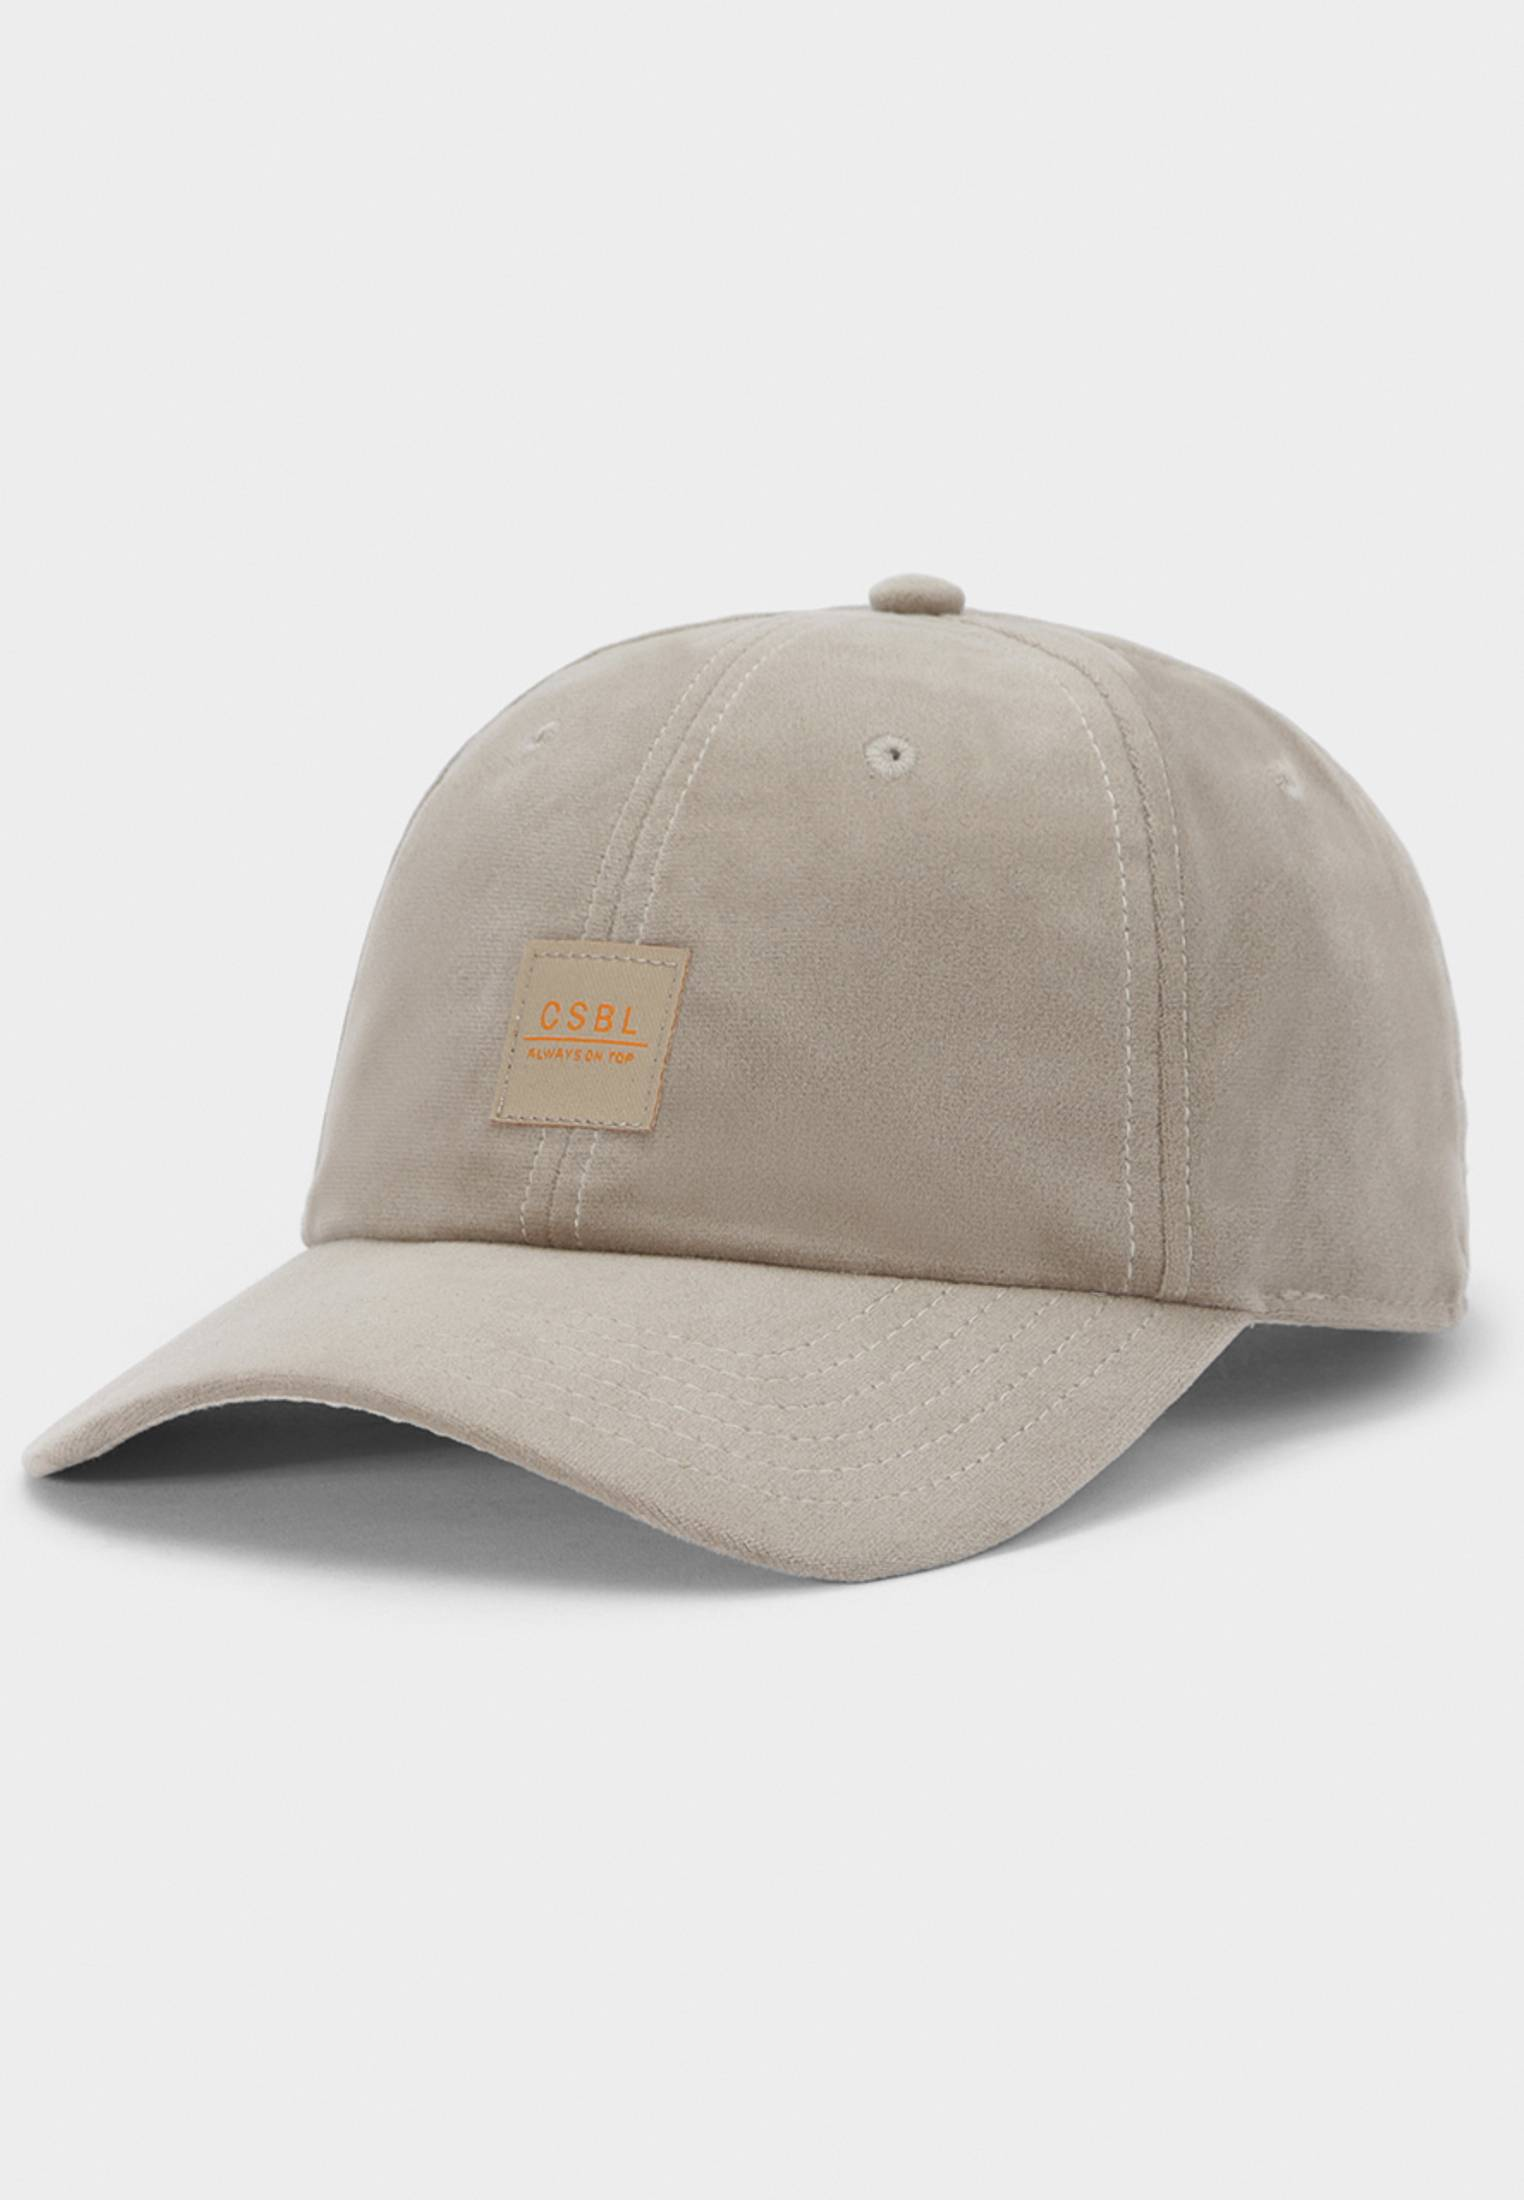 Urban Classics CSBL New Age Curved Cap beige - One Size